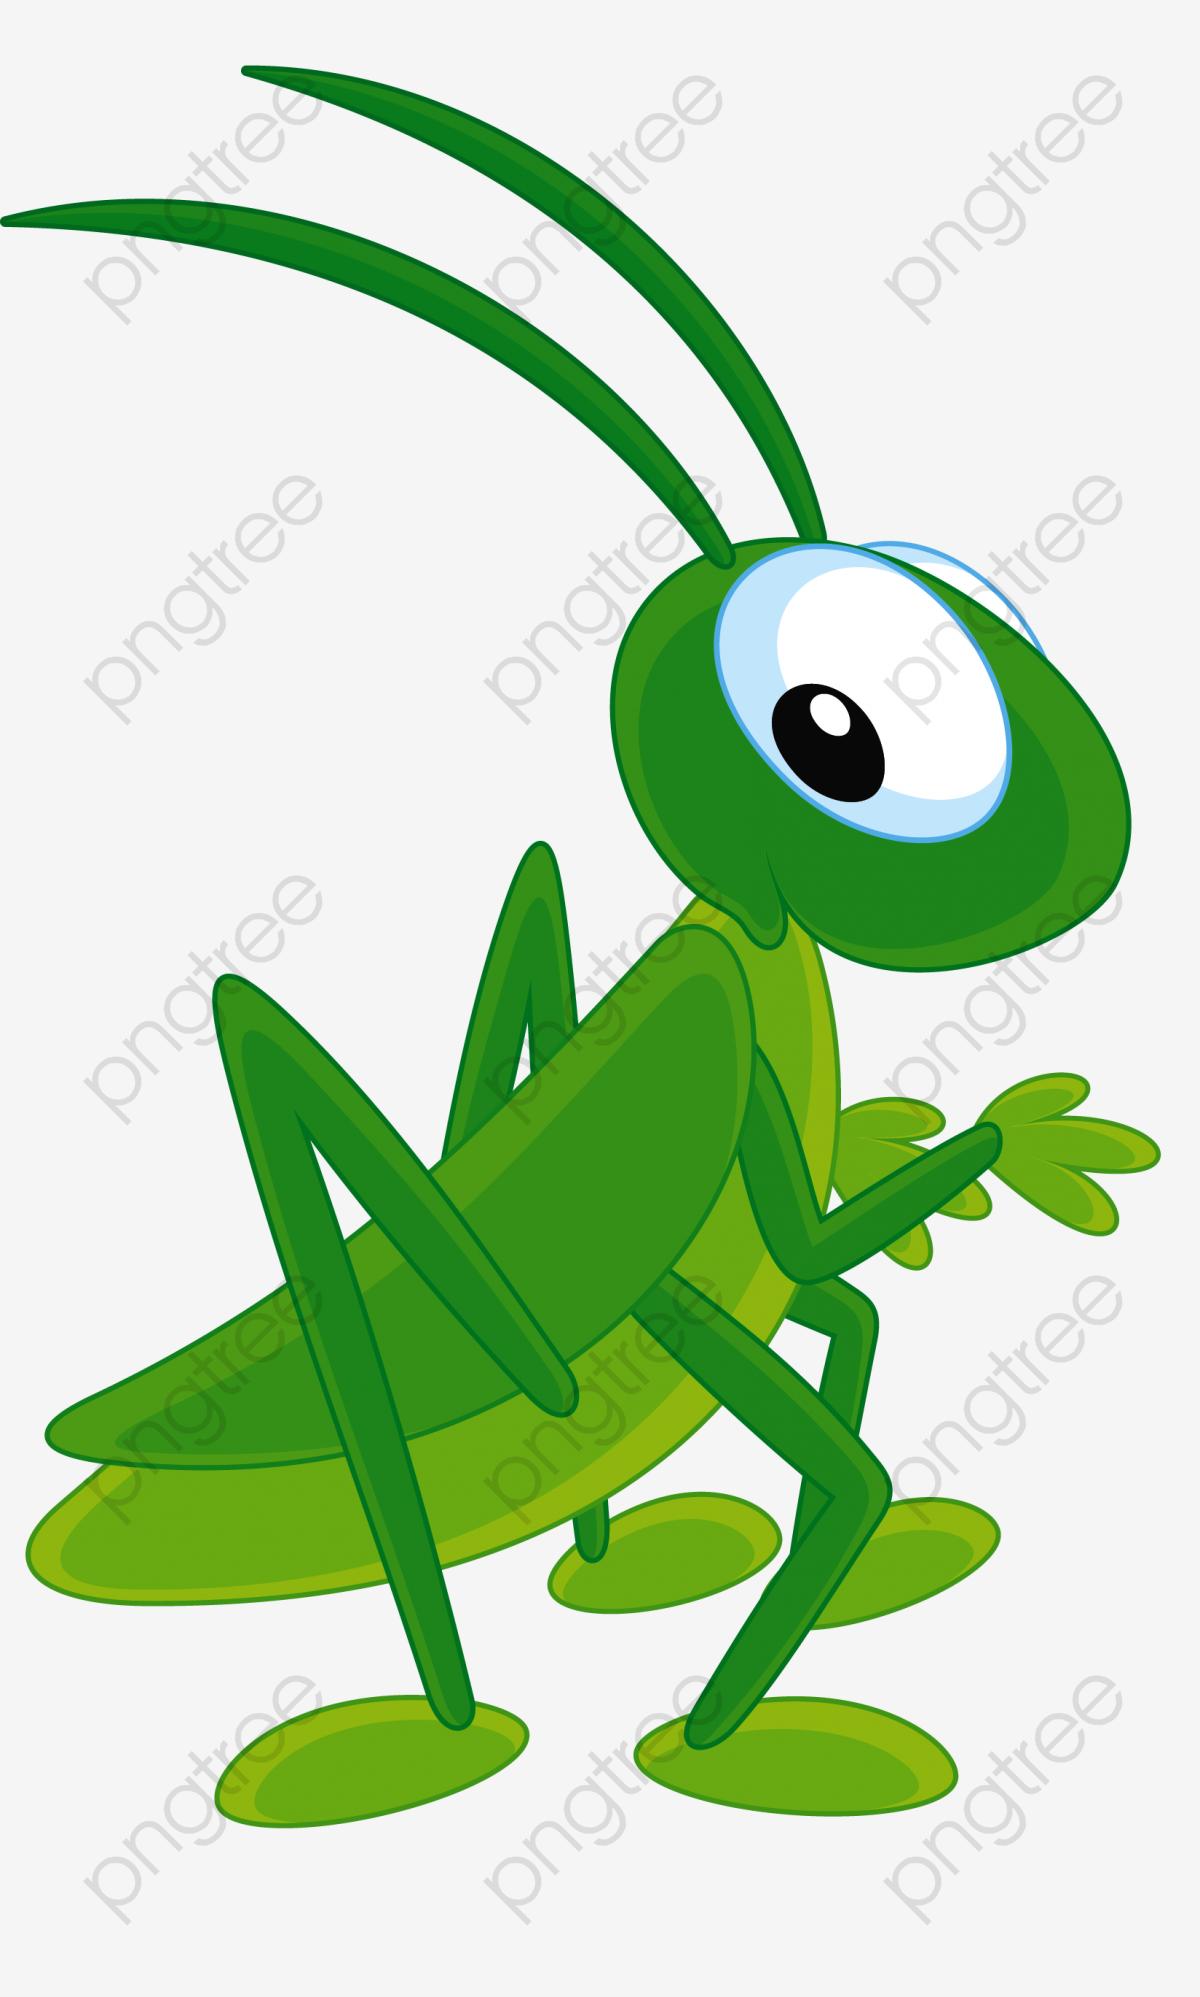 Green Grasshopper, Grasshopper Clipart, Migratory Locust.